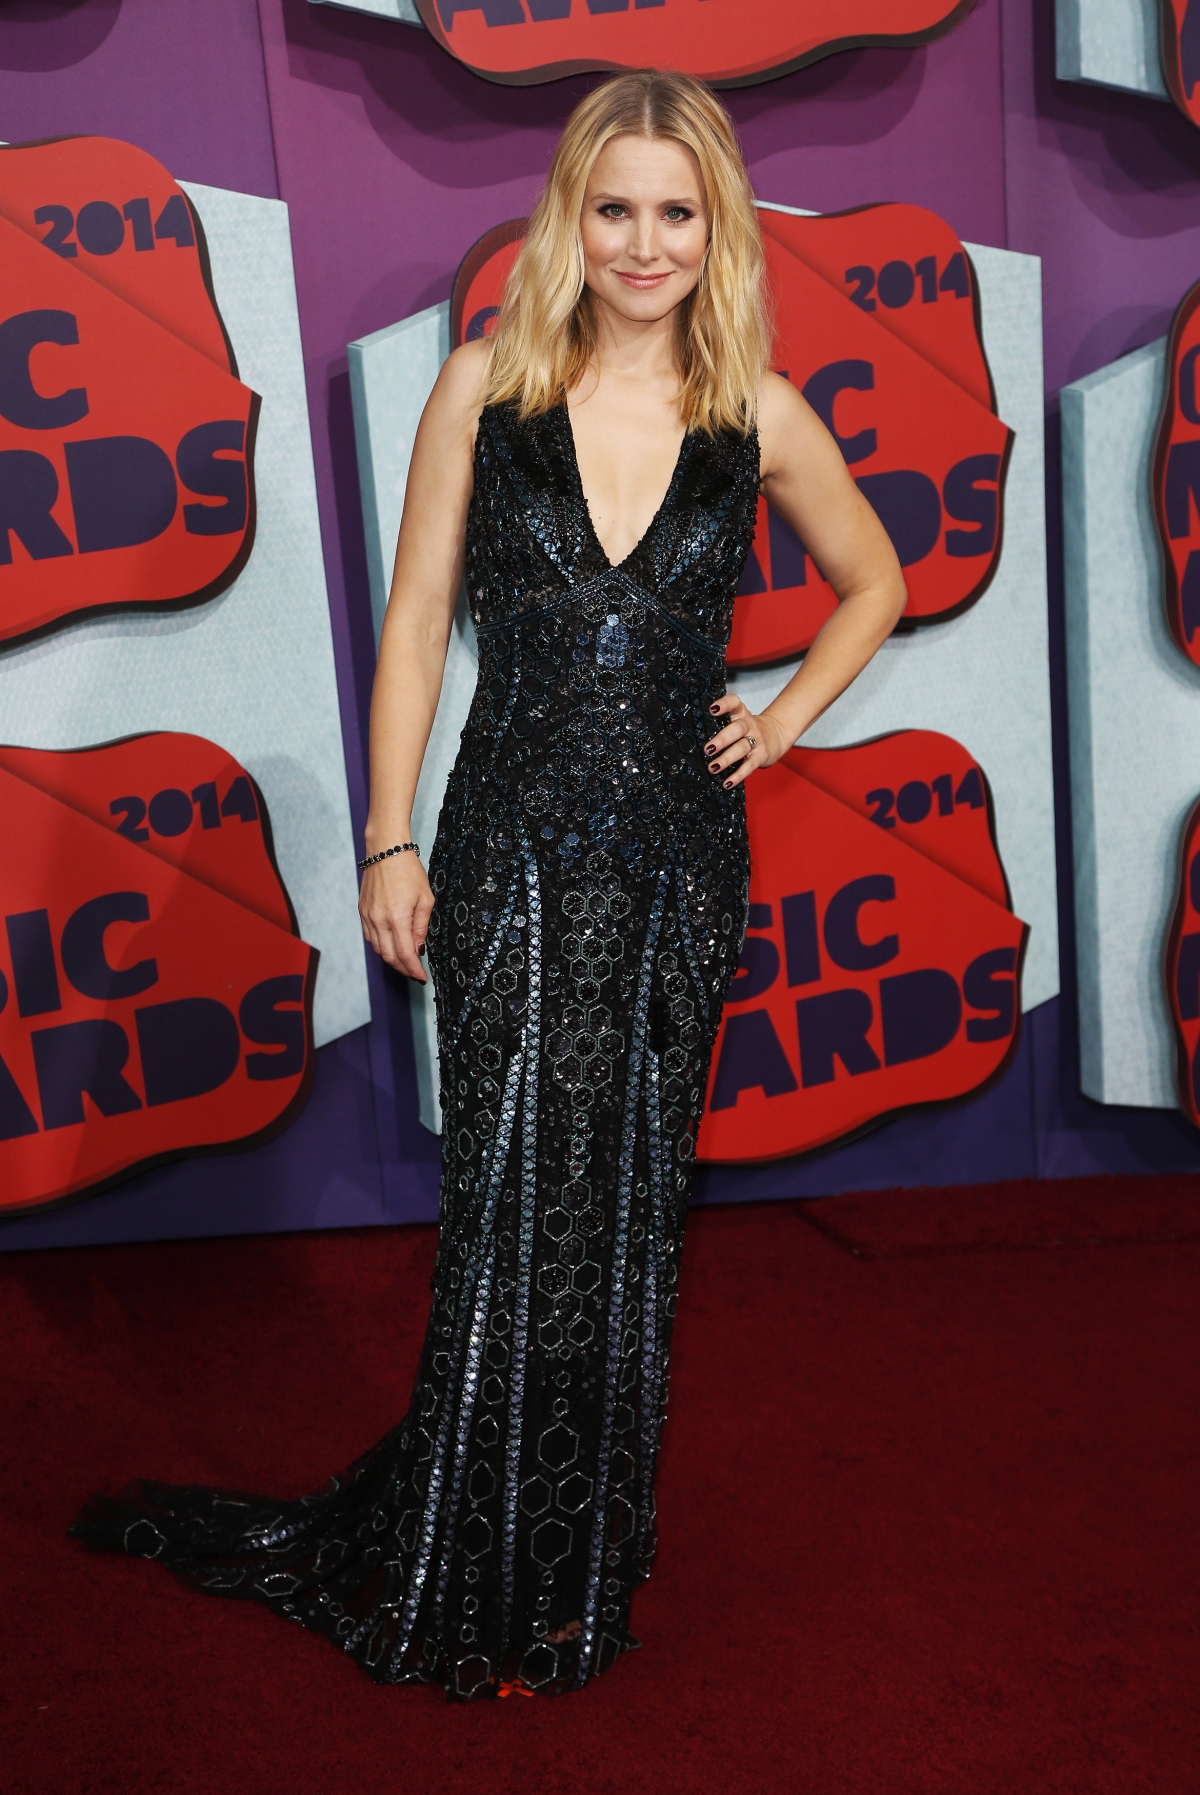 Host Kristen Bell arrives at the 2014 CMT Music Awards in Nashville, Tennessee June 4, 2014.